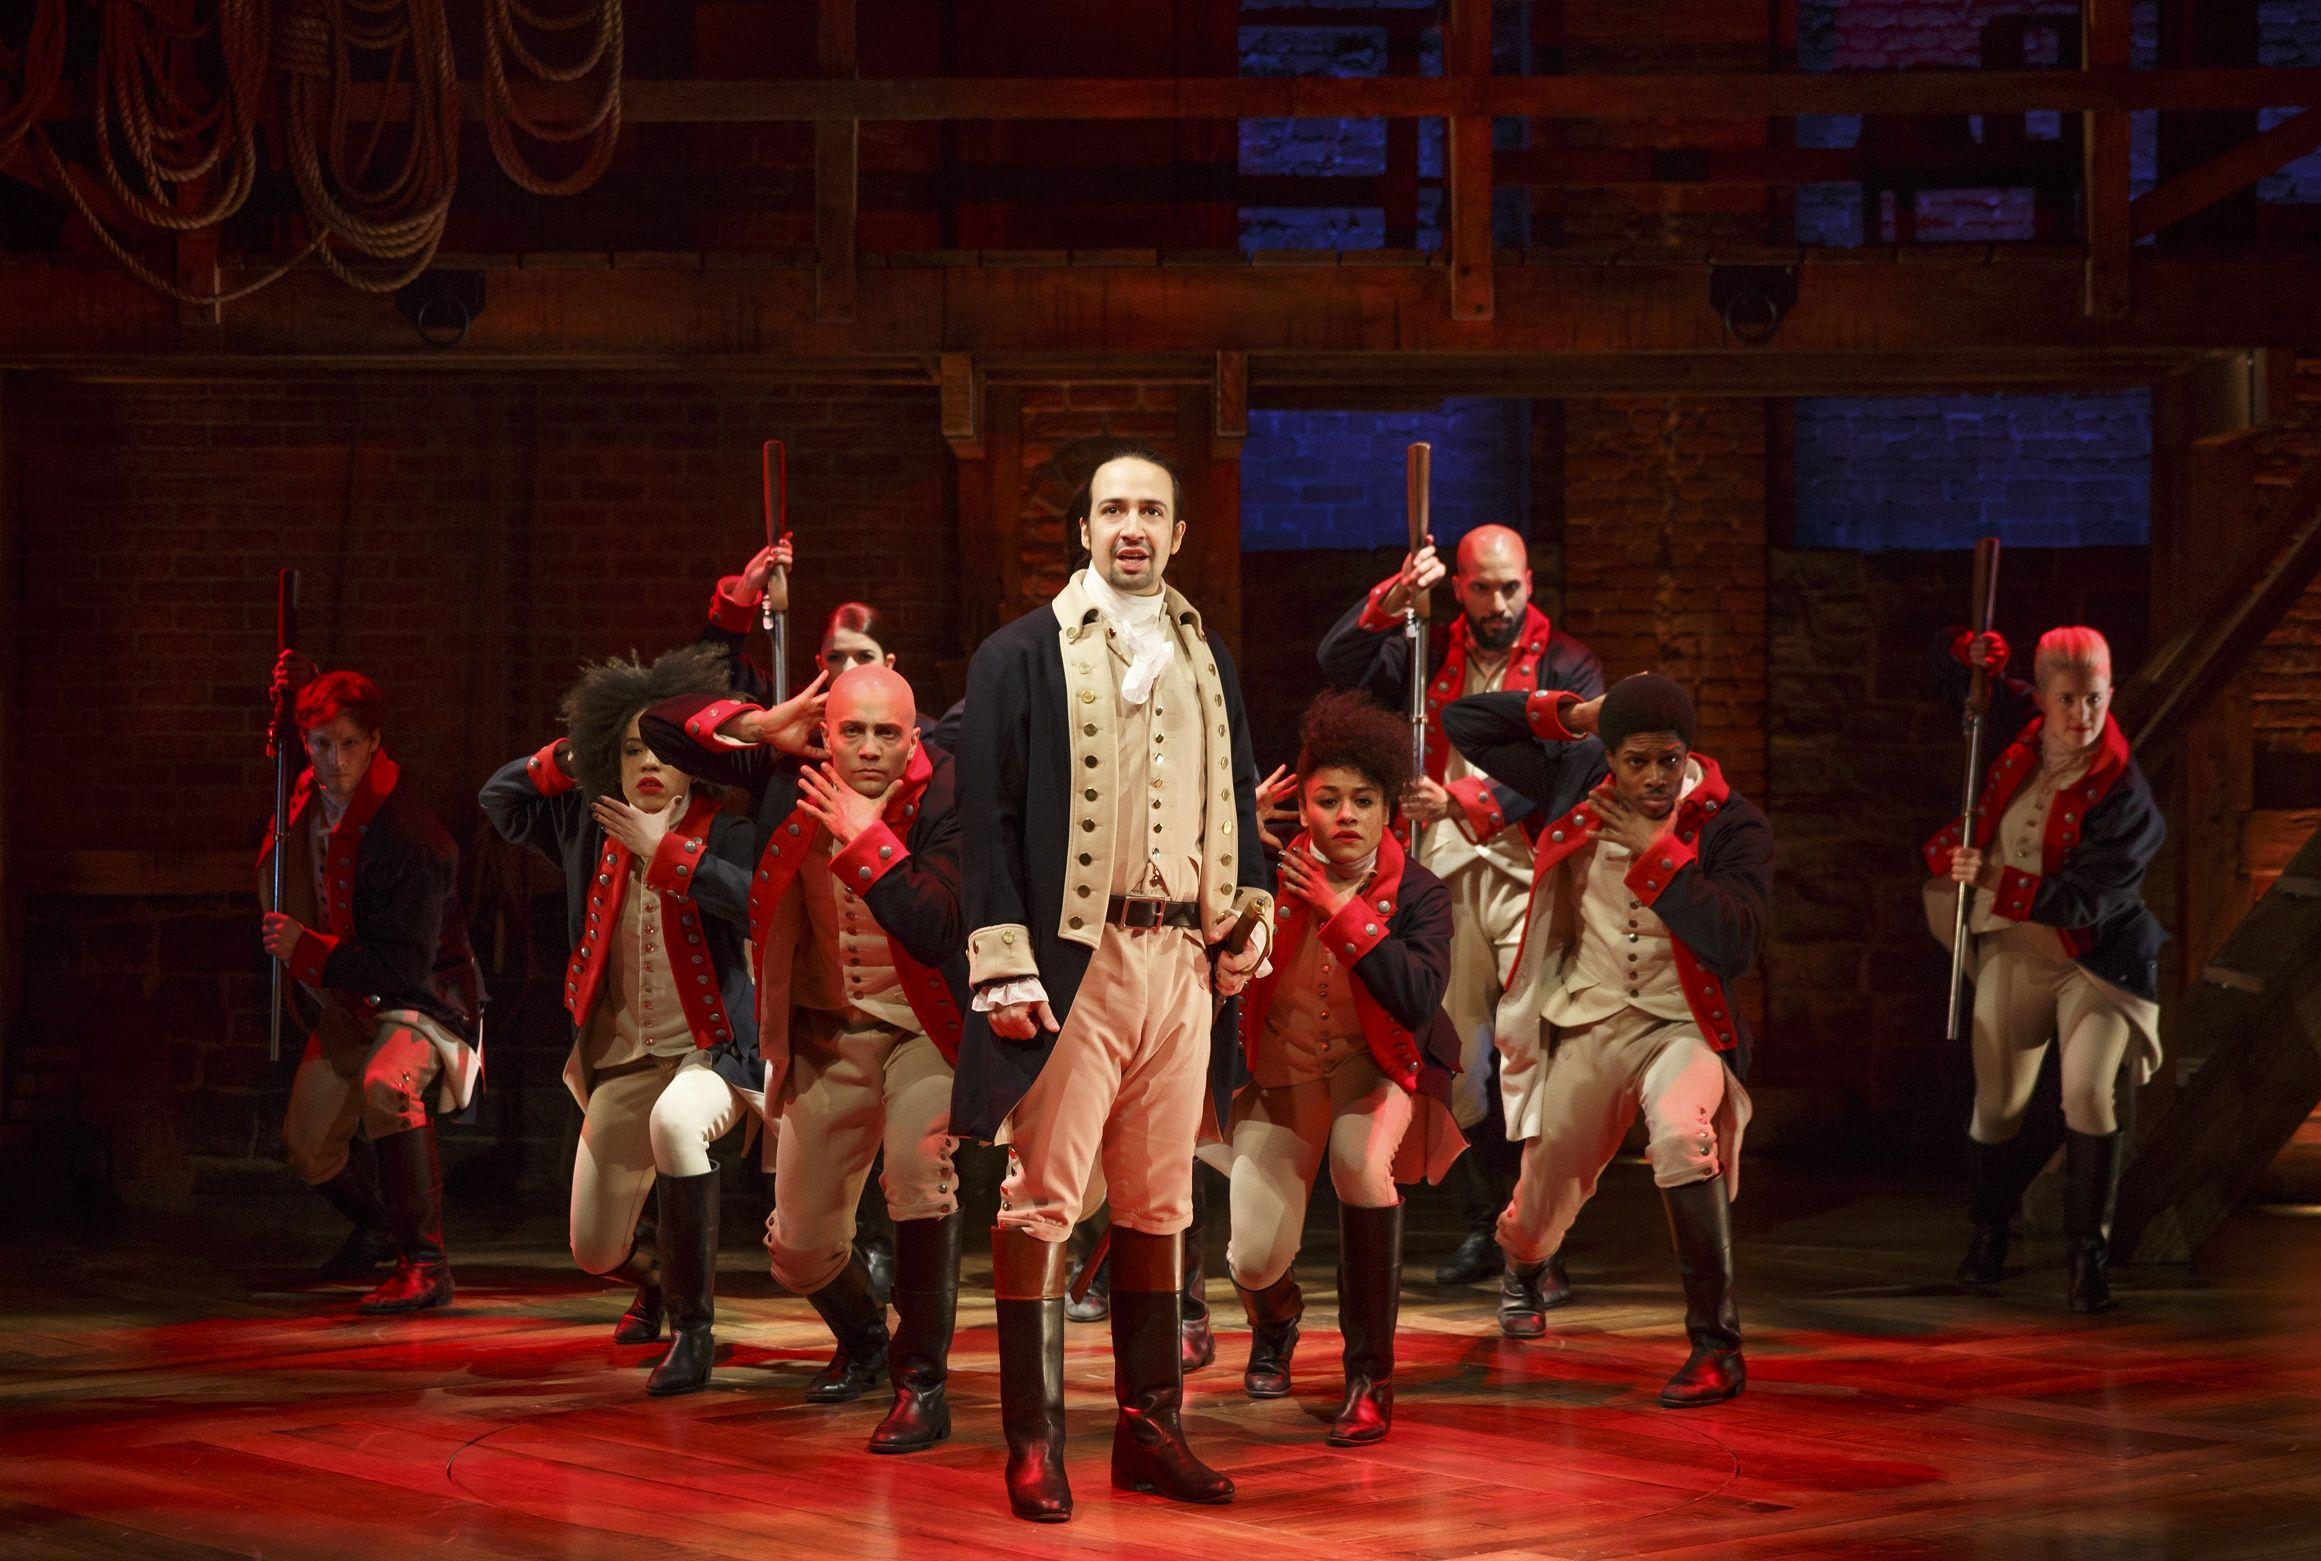 Cena do musical 'Hamilton', com Lin-Manuel Miranda